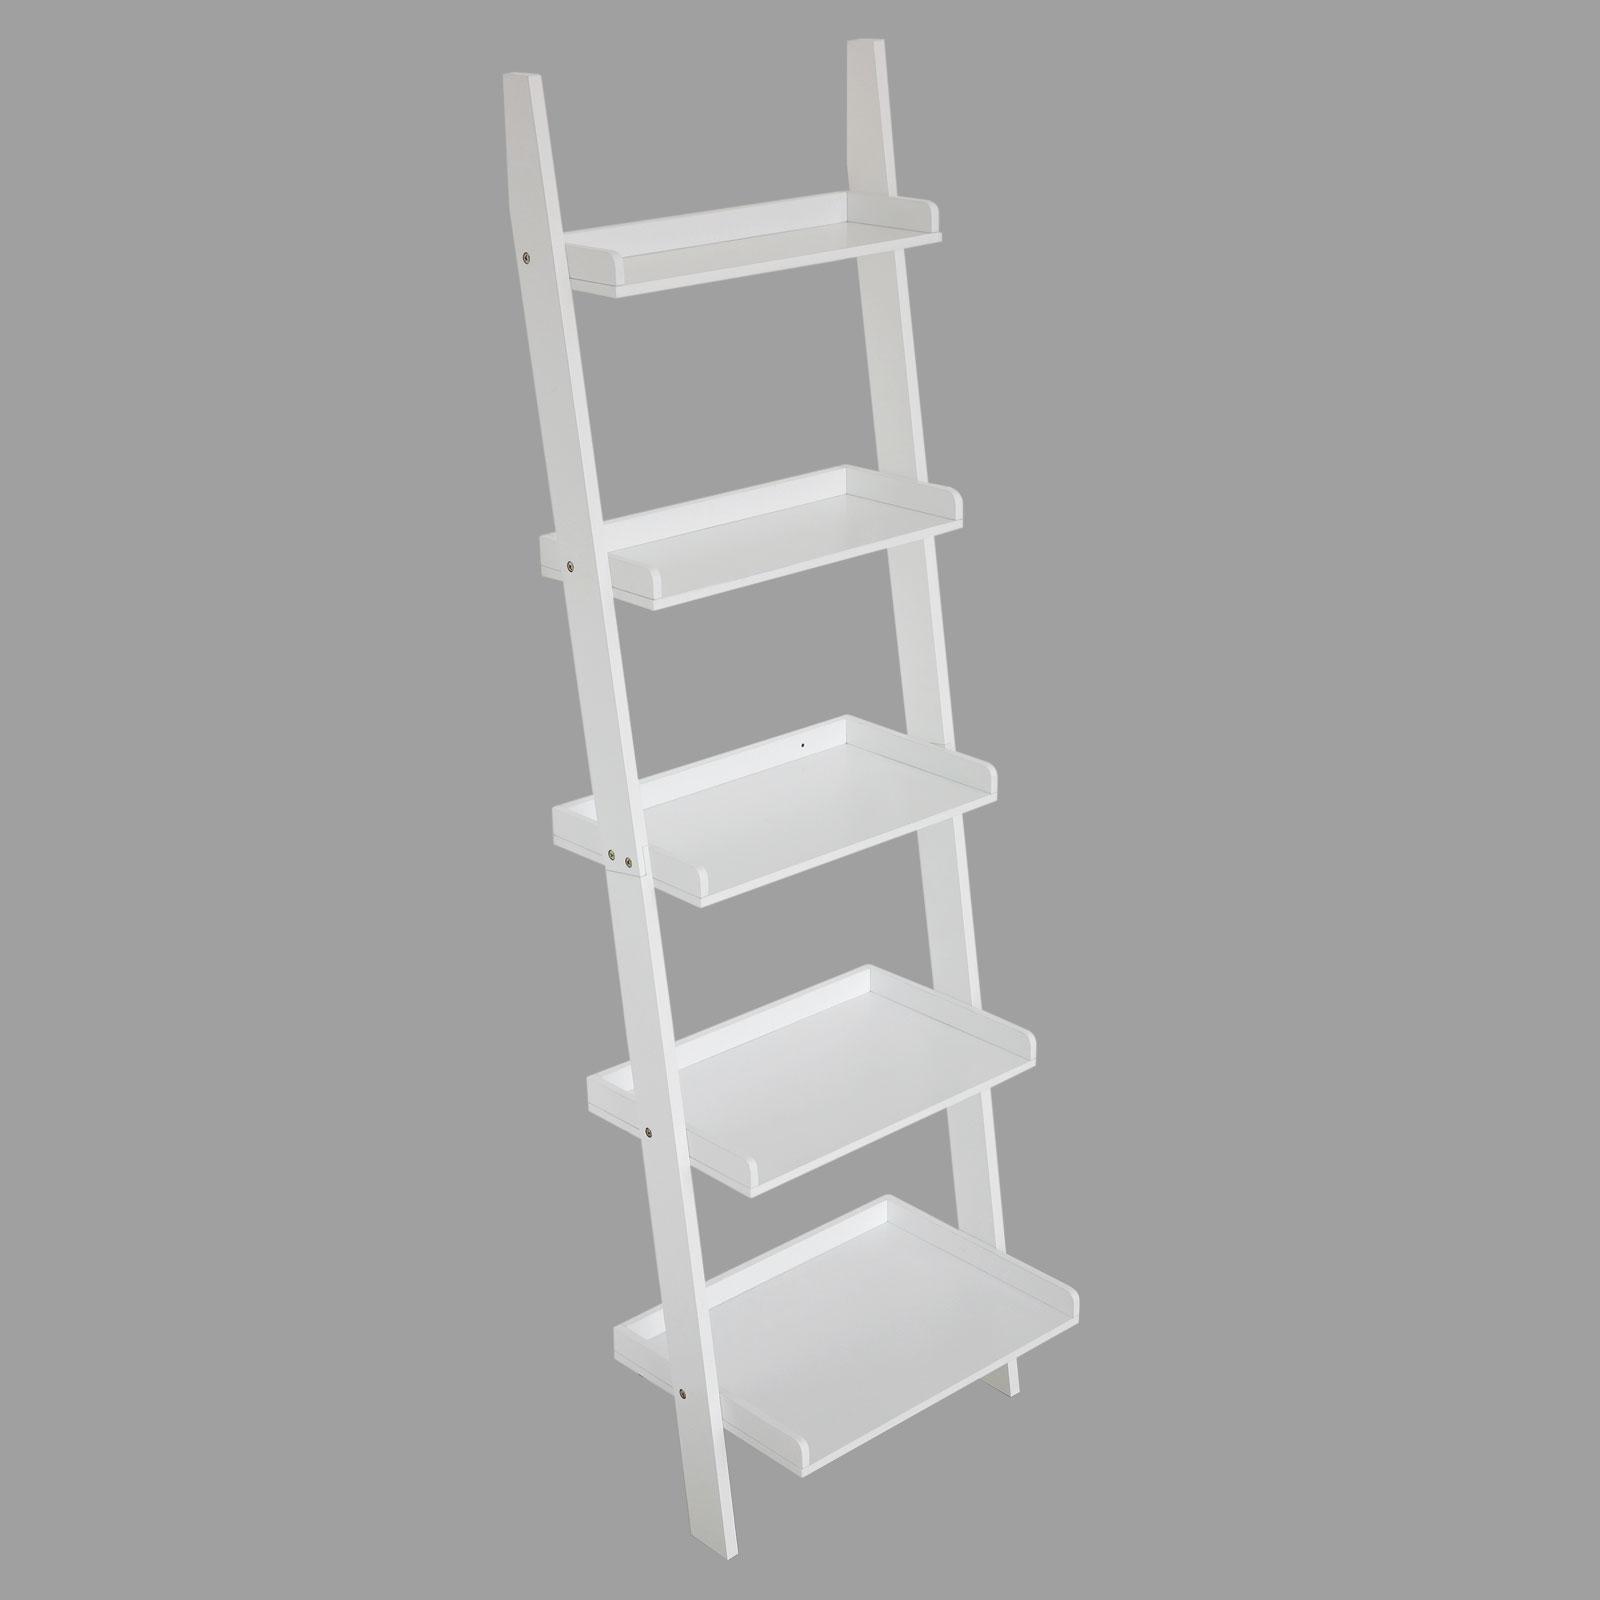 5 Tier Wall Rack Leaning Ladder Shelf Storage Bookshelf E1